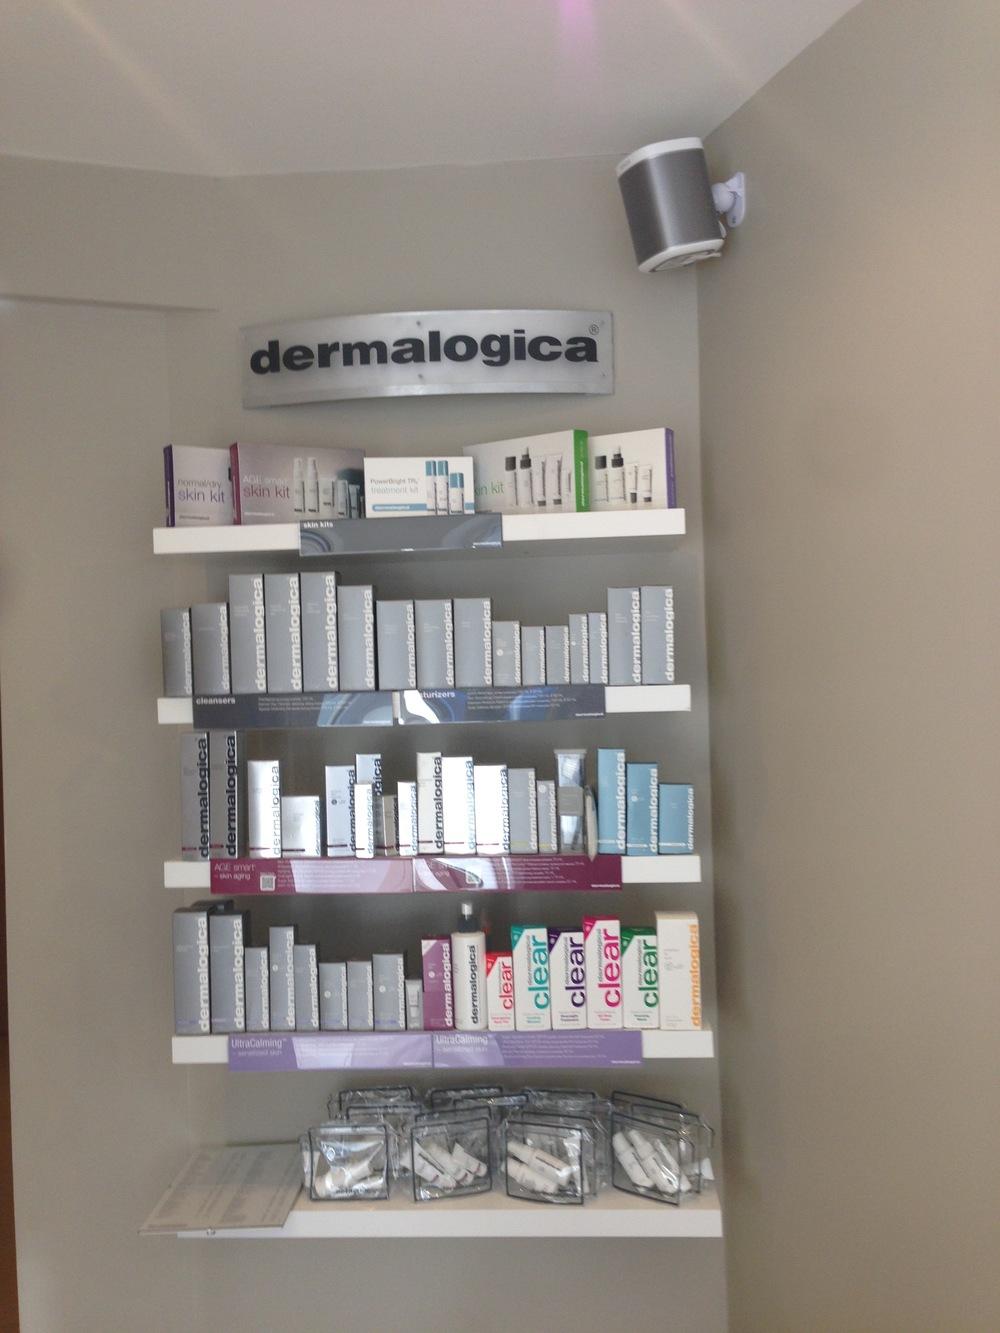 Dermalogica Home Care